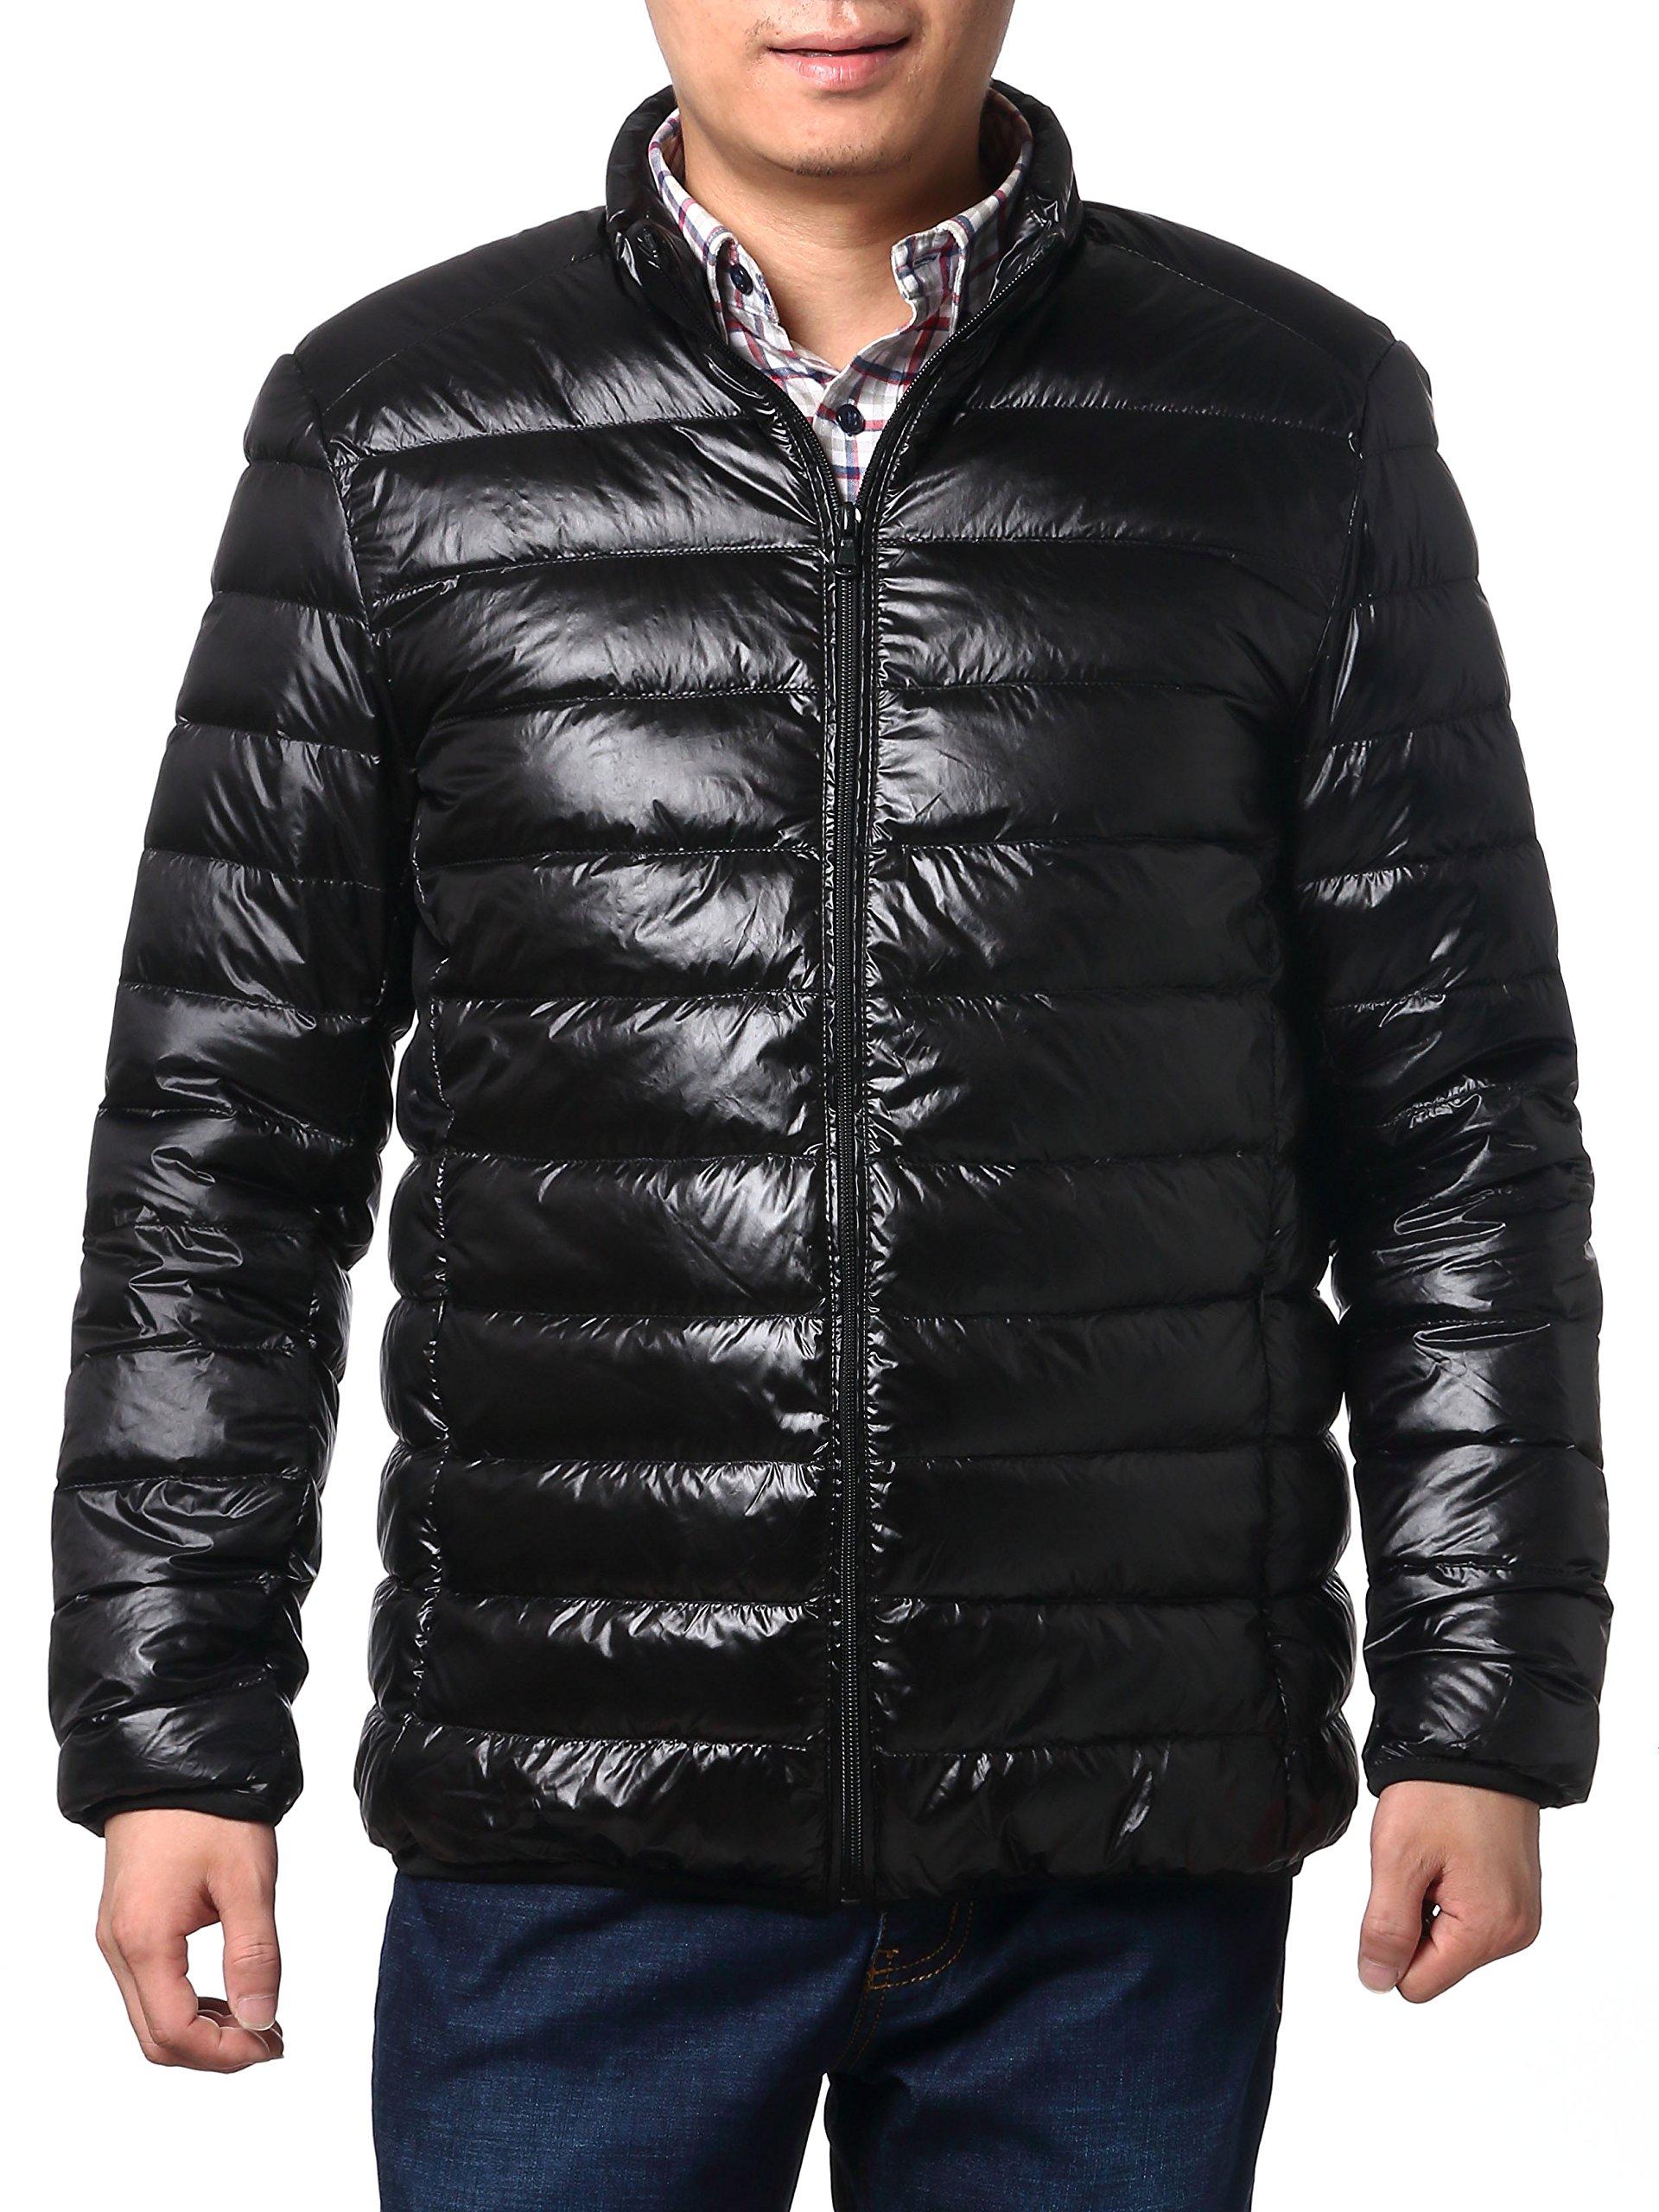 Multicolor Jackets Lightweight Puffer Jacket,Packable Down Jacket For Men (L, Black)